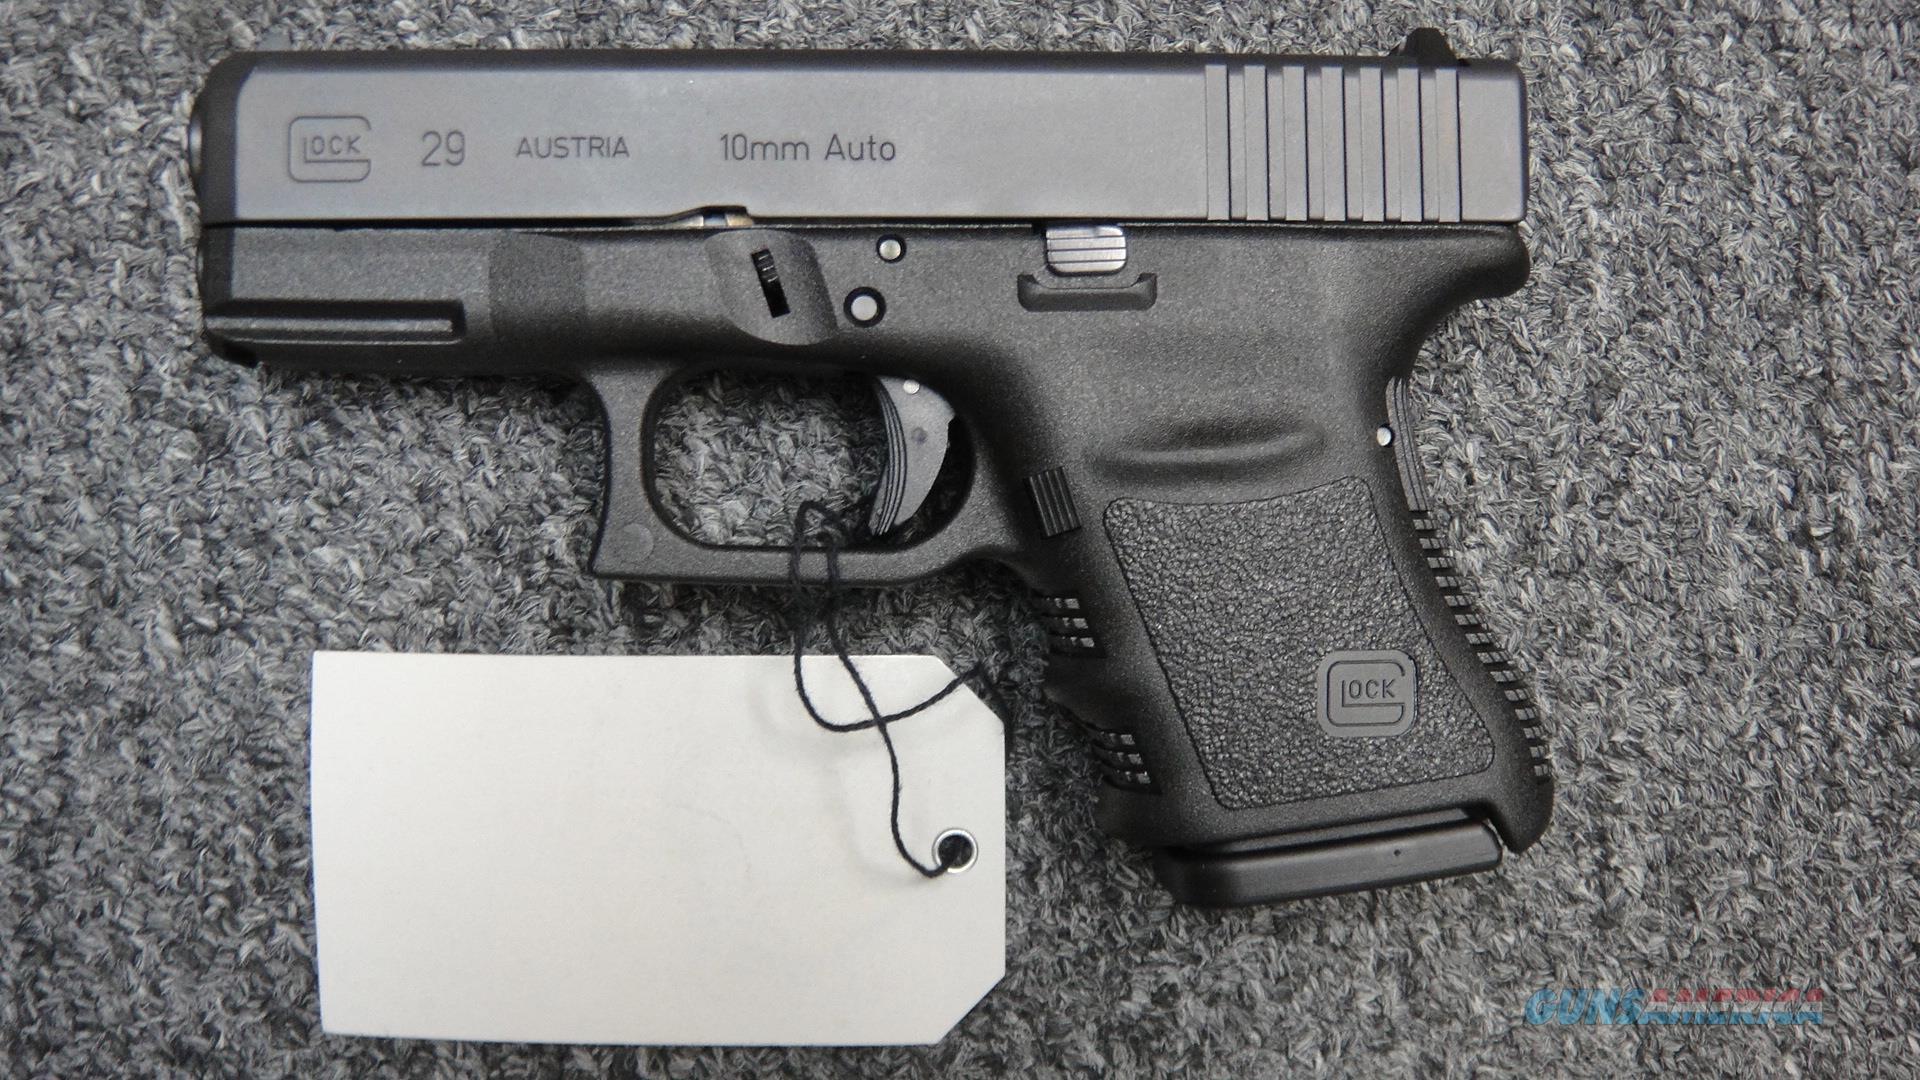 Glock 29 10mm  Guns > Pistols > Glock Pistols > 29/30/36